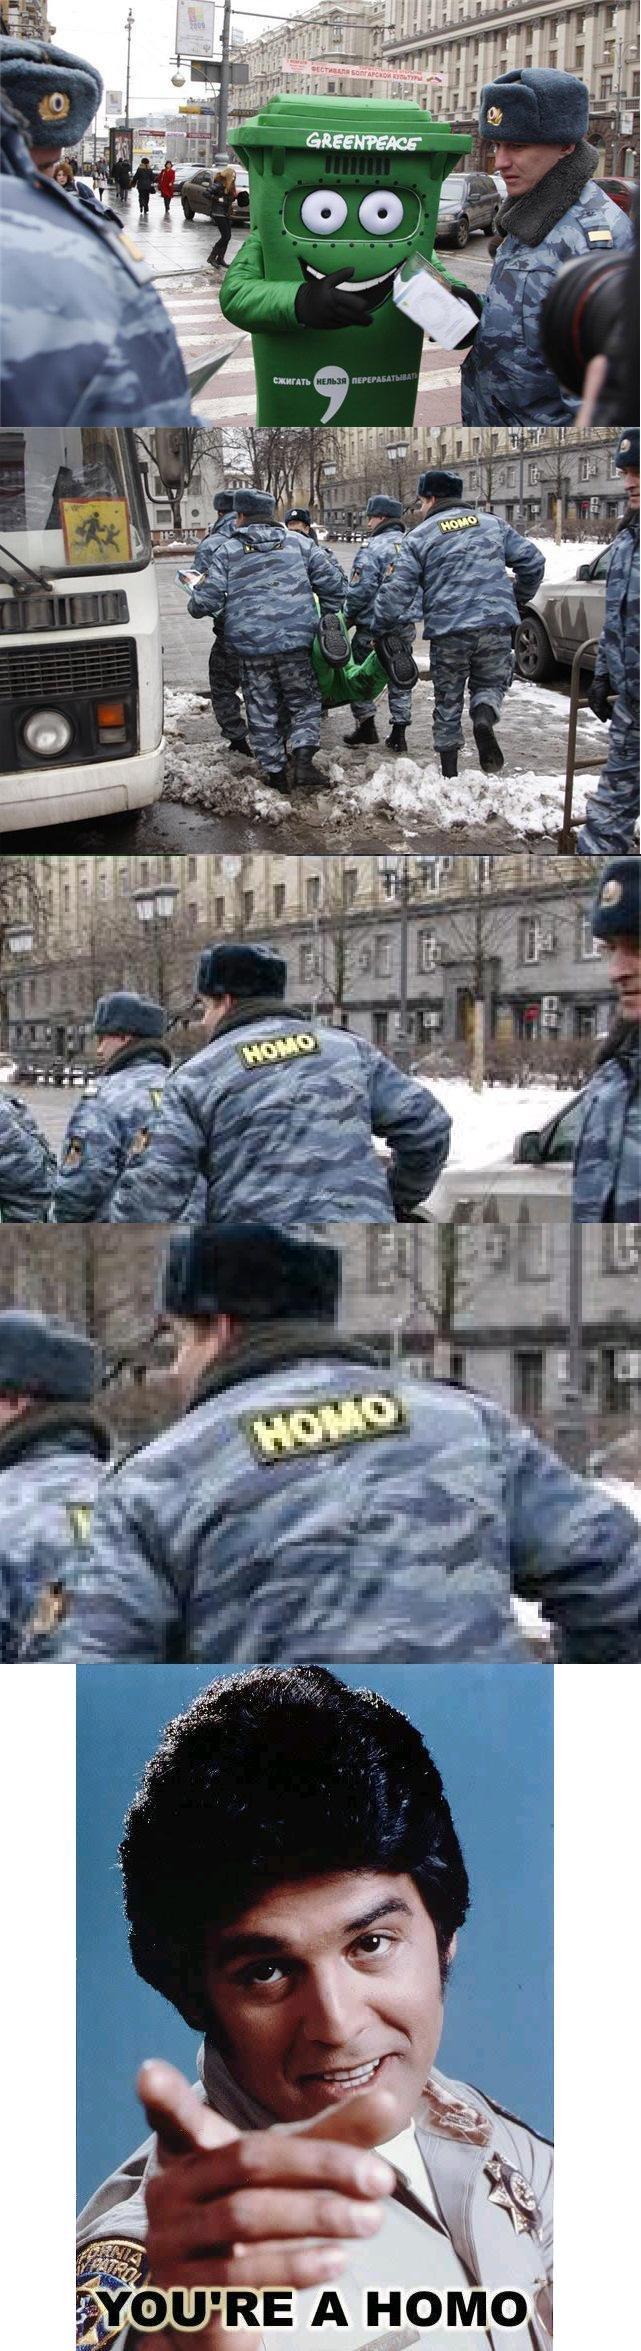 HOMO. If Ponch calls you a homo, you're a homo.. dur- Ehhr, A lloll! lailii! l'!. the homo is Taken Out The Trash! You are a homo